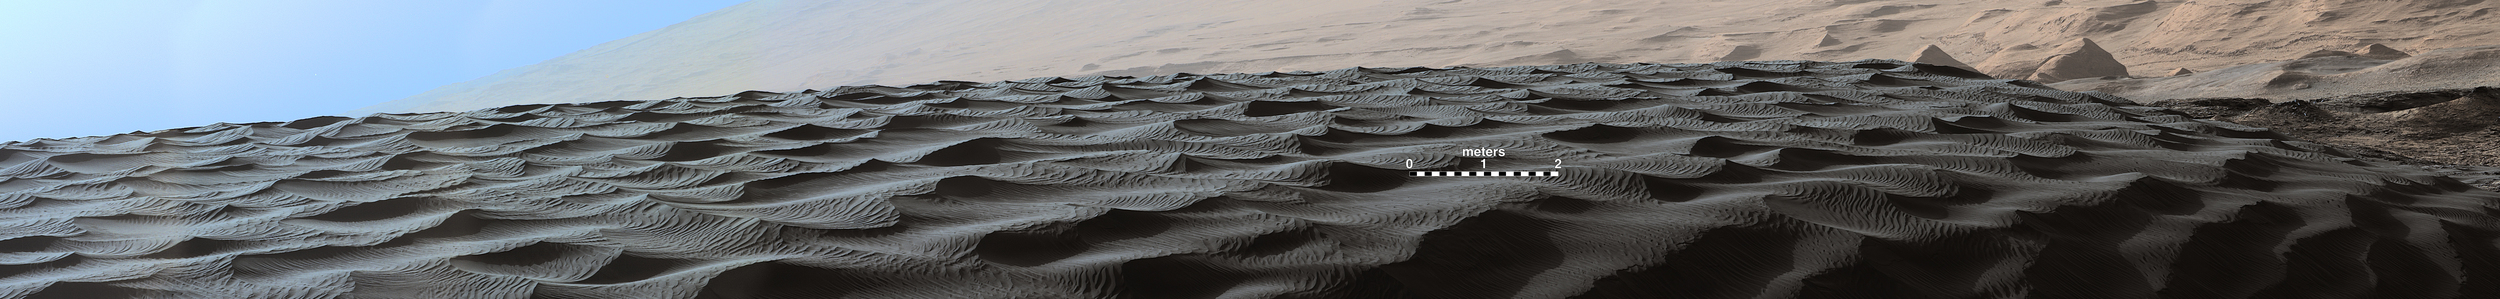 Full image - Image Credit NASA/JPL-Caltech/MSSS